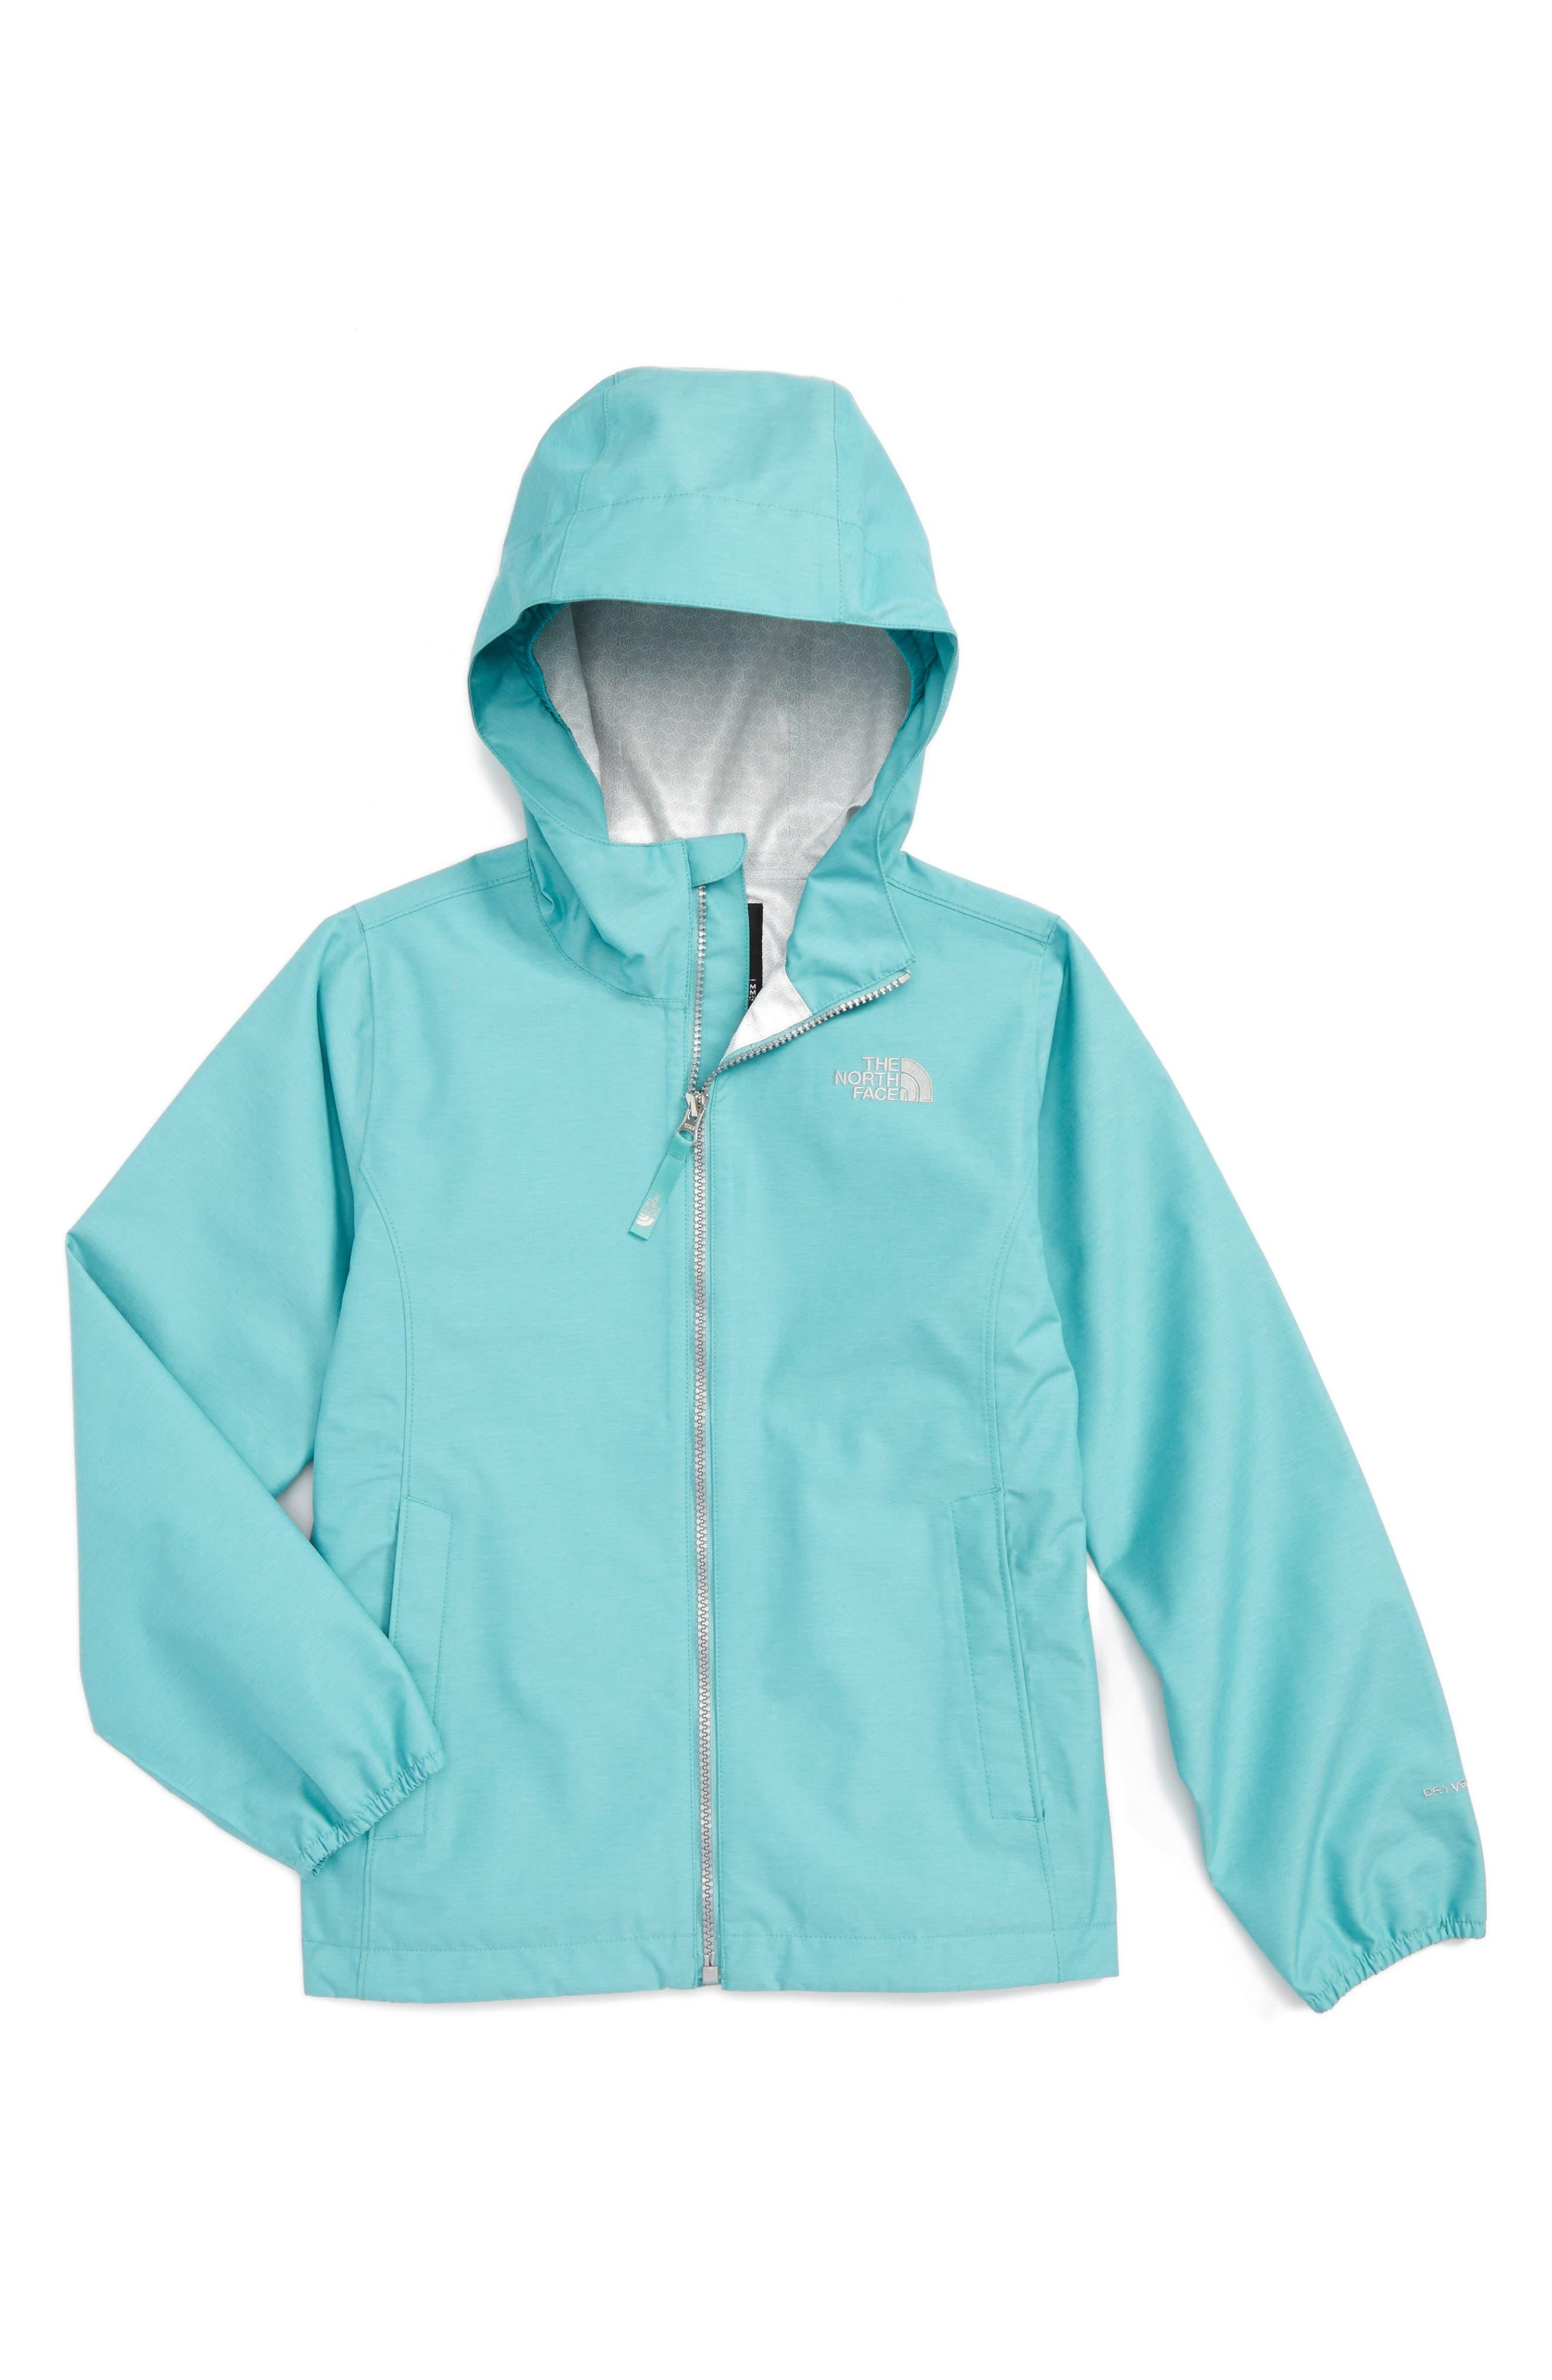 Alternate Image 1 Selected - The North Face Magnolia Waterproof HyVent® Rain Jacket (Big Girls)